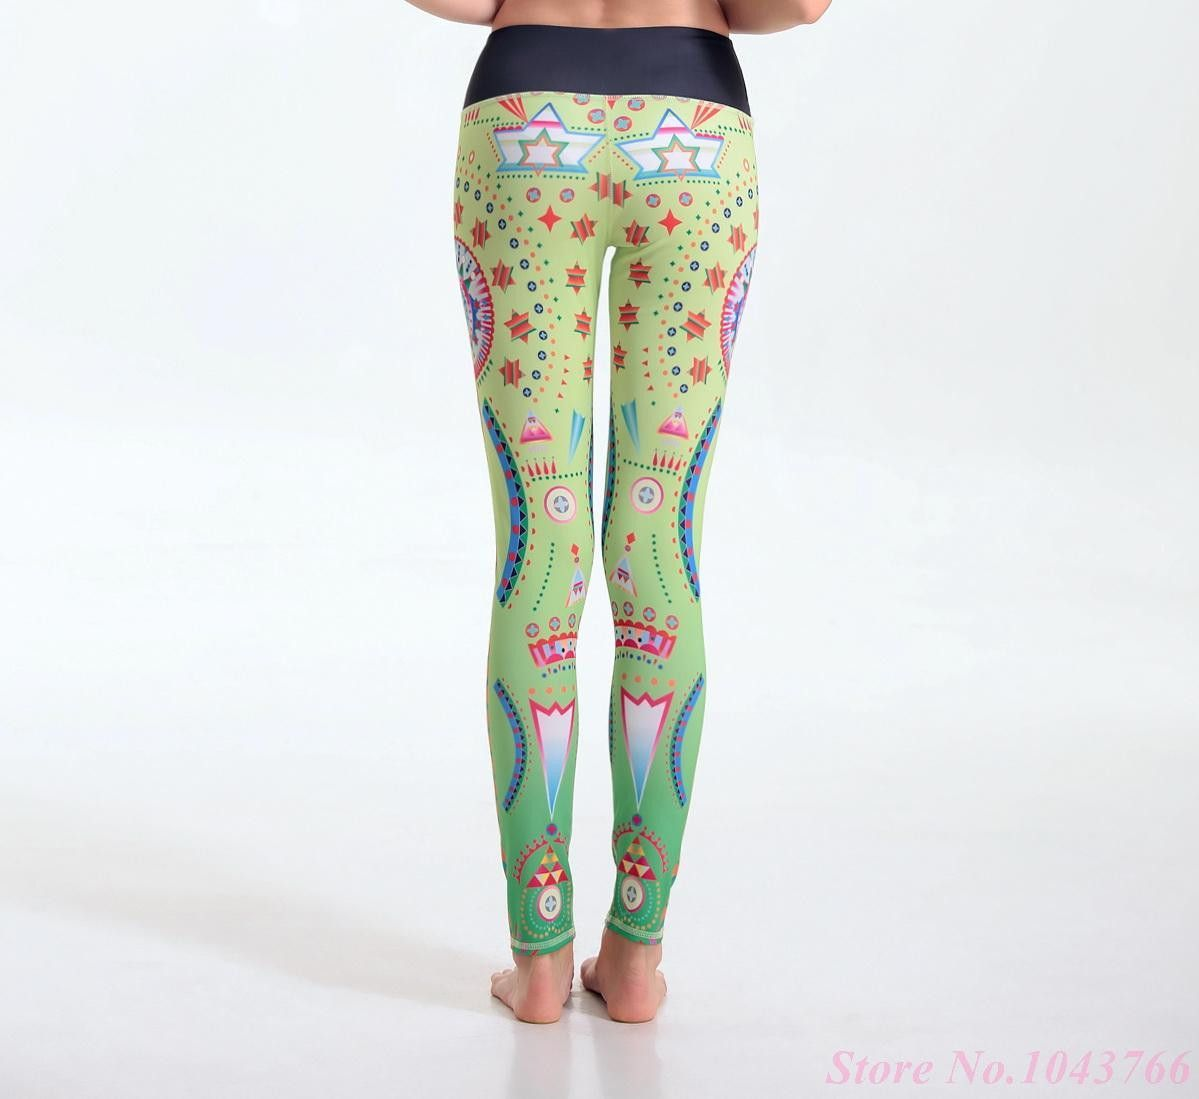 Sexy Push Up Women Sportwear Leggings Fitness Yoga Pants Tight Stretchy Sports